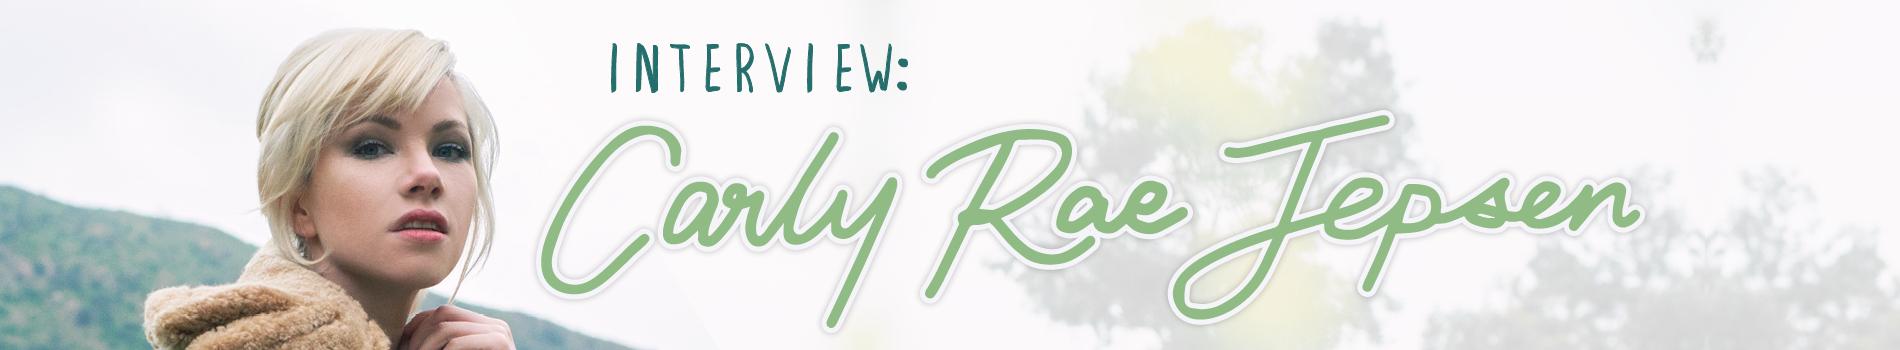 Carly Rae Jepsen - Masthead Banner